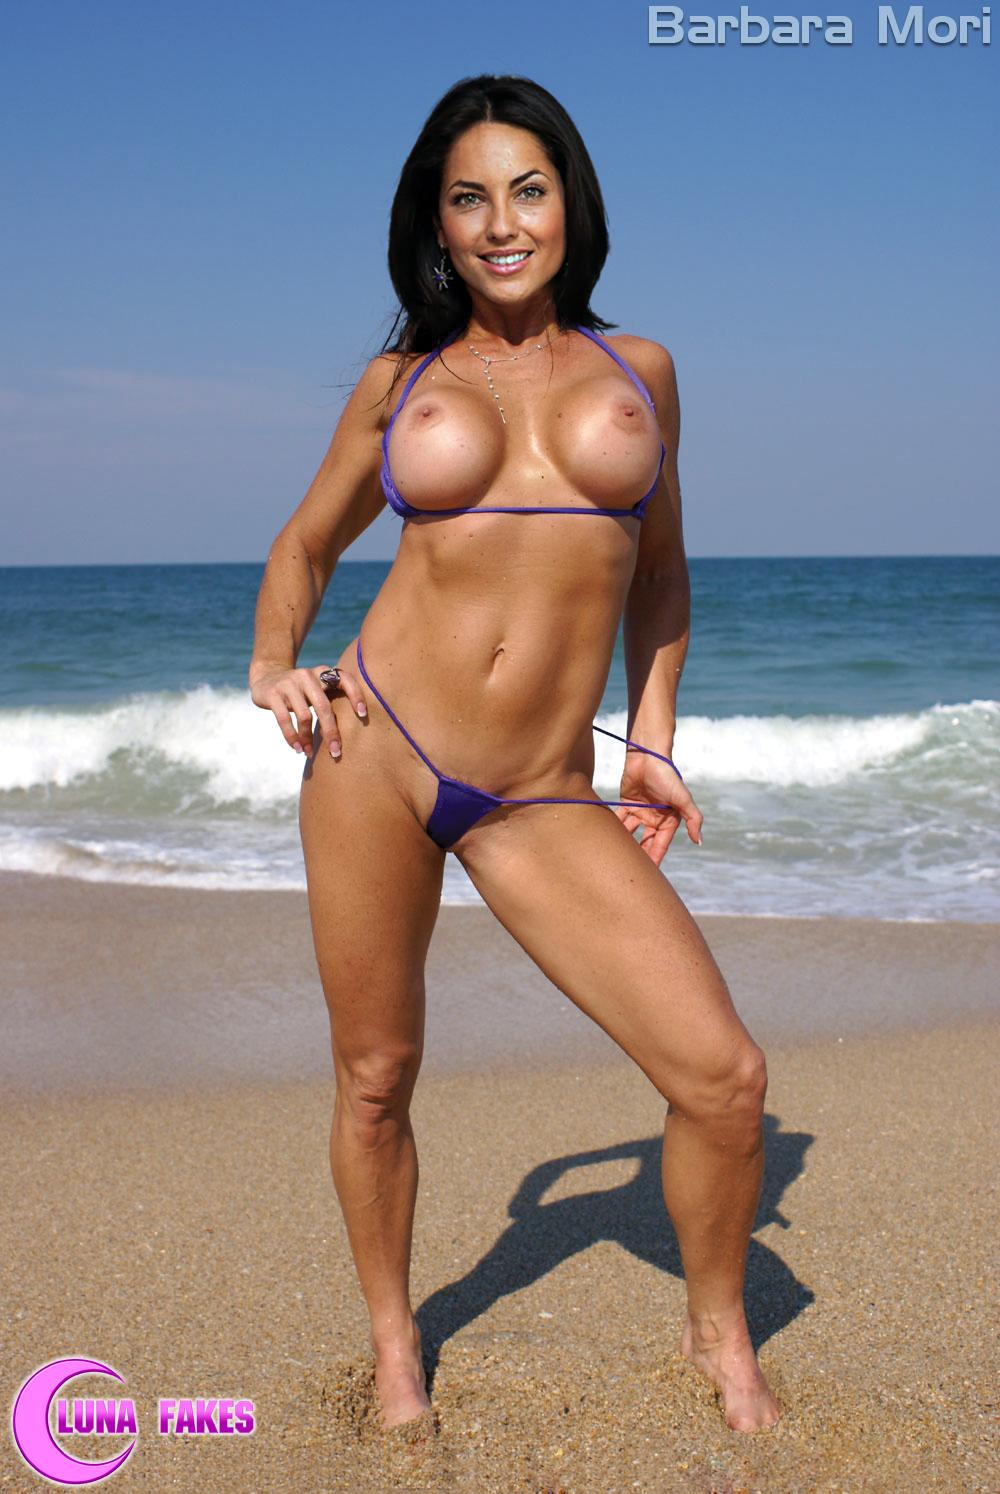 Porn pics of Barbara Bain Page 1 -